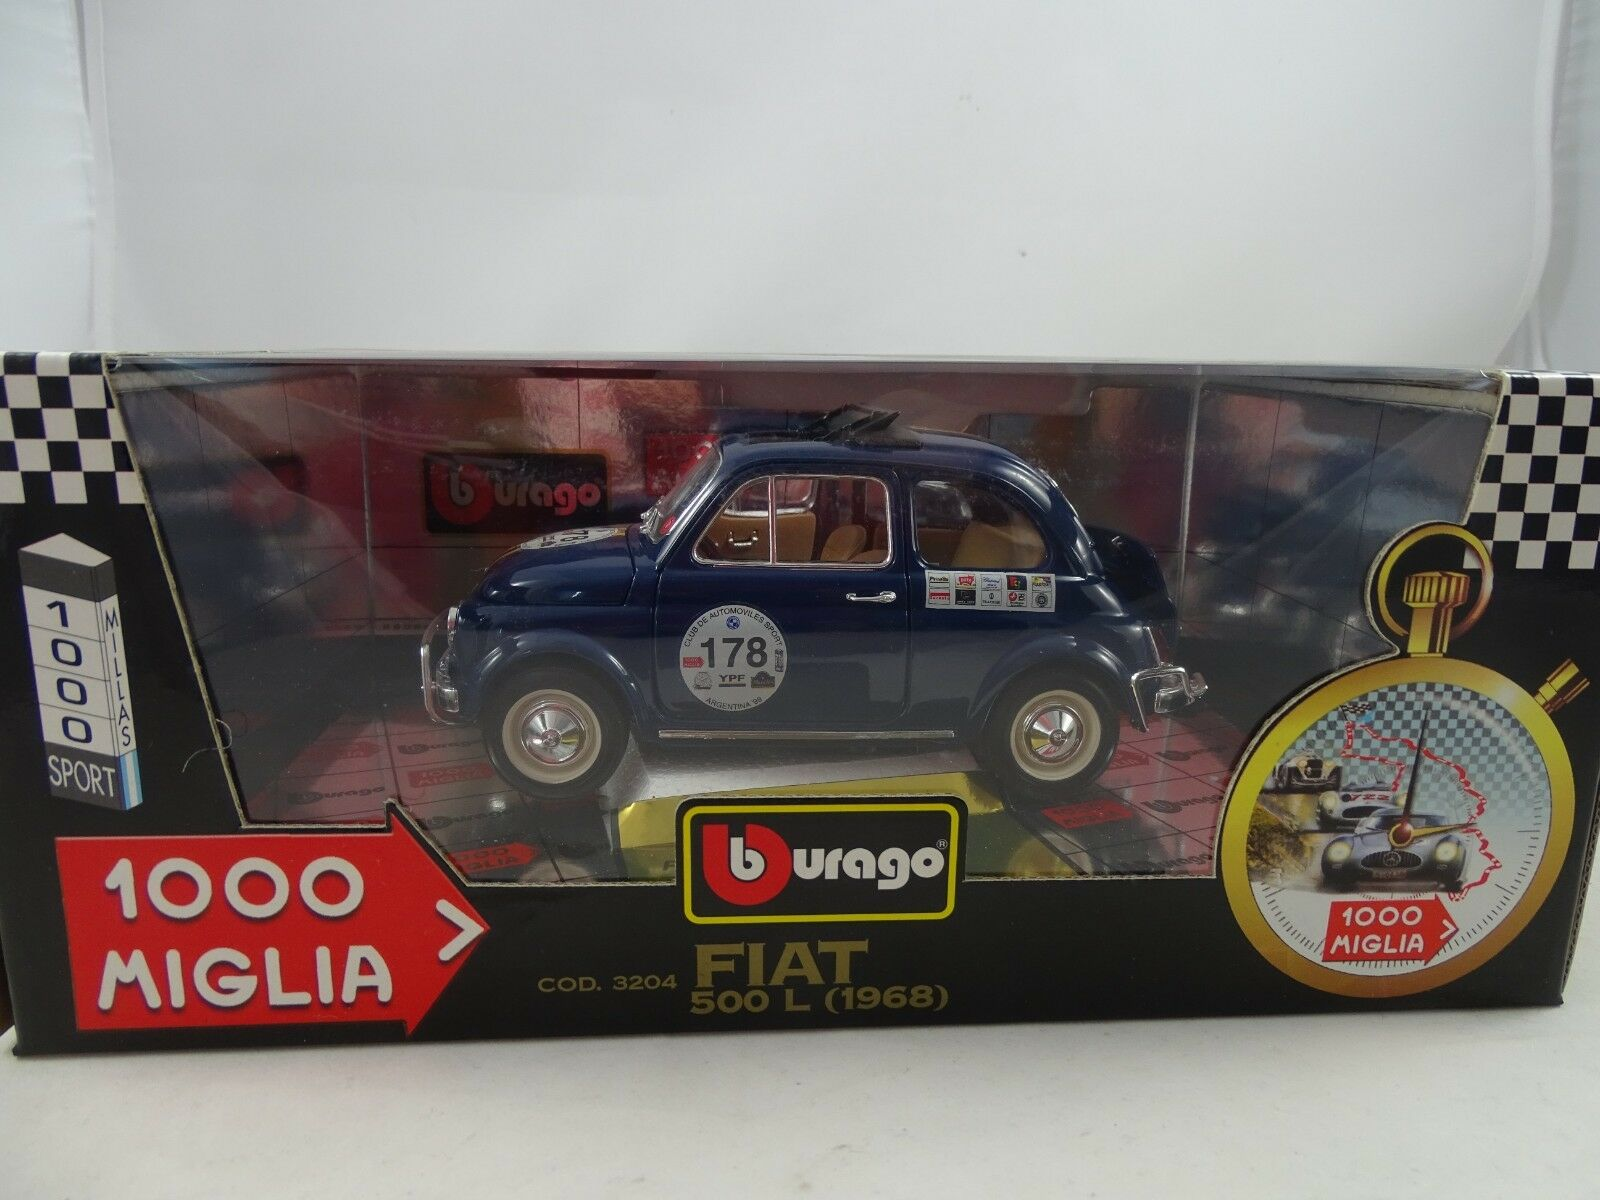 1 18 Bburago MIGLIA FIAT 500 L 1968 bluee  - RARITÄT §